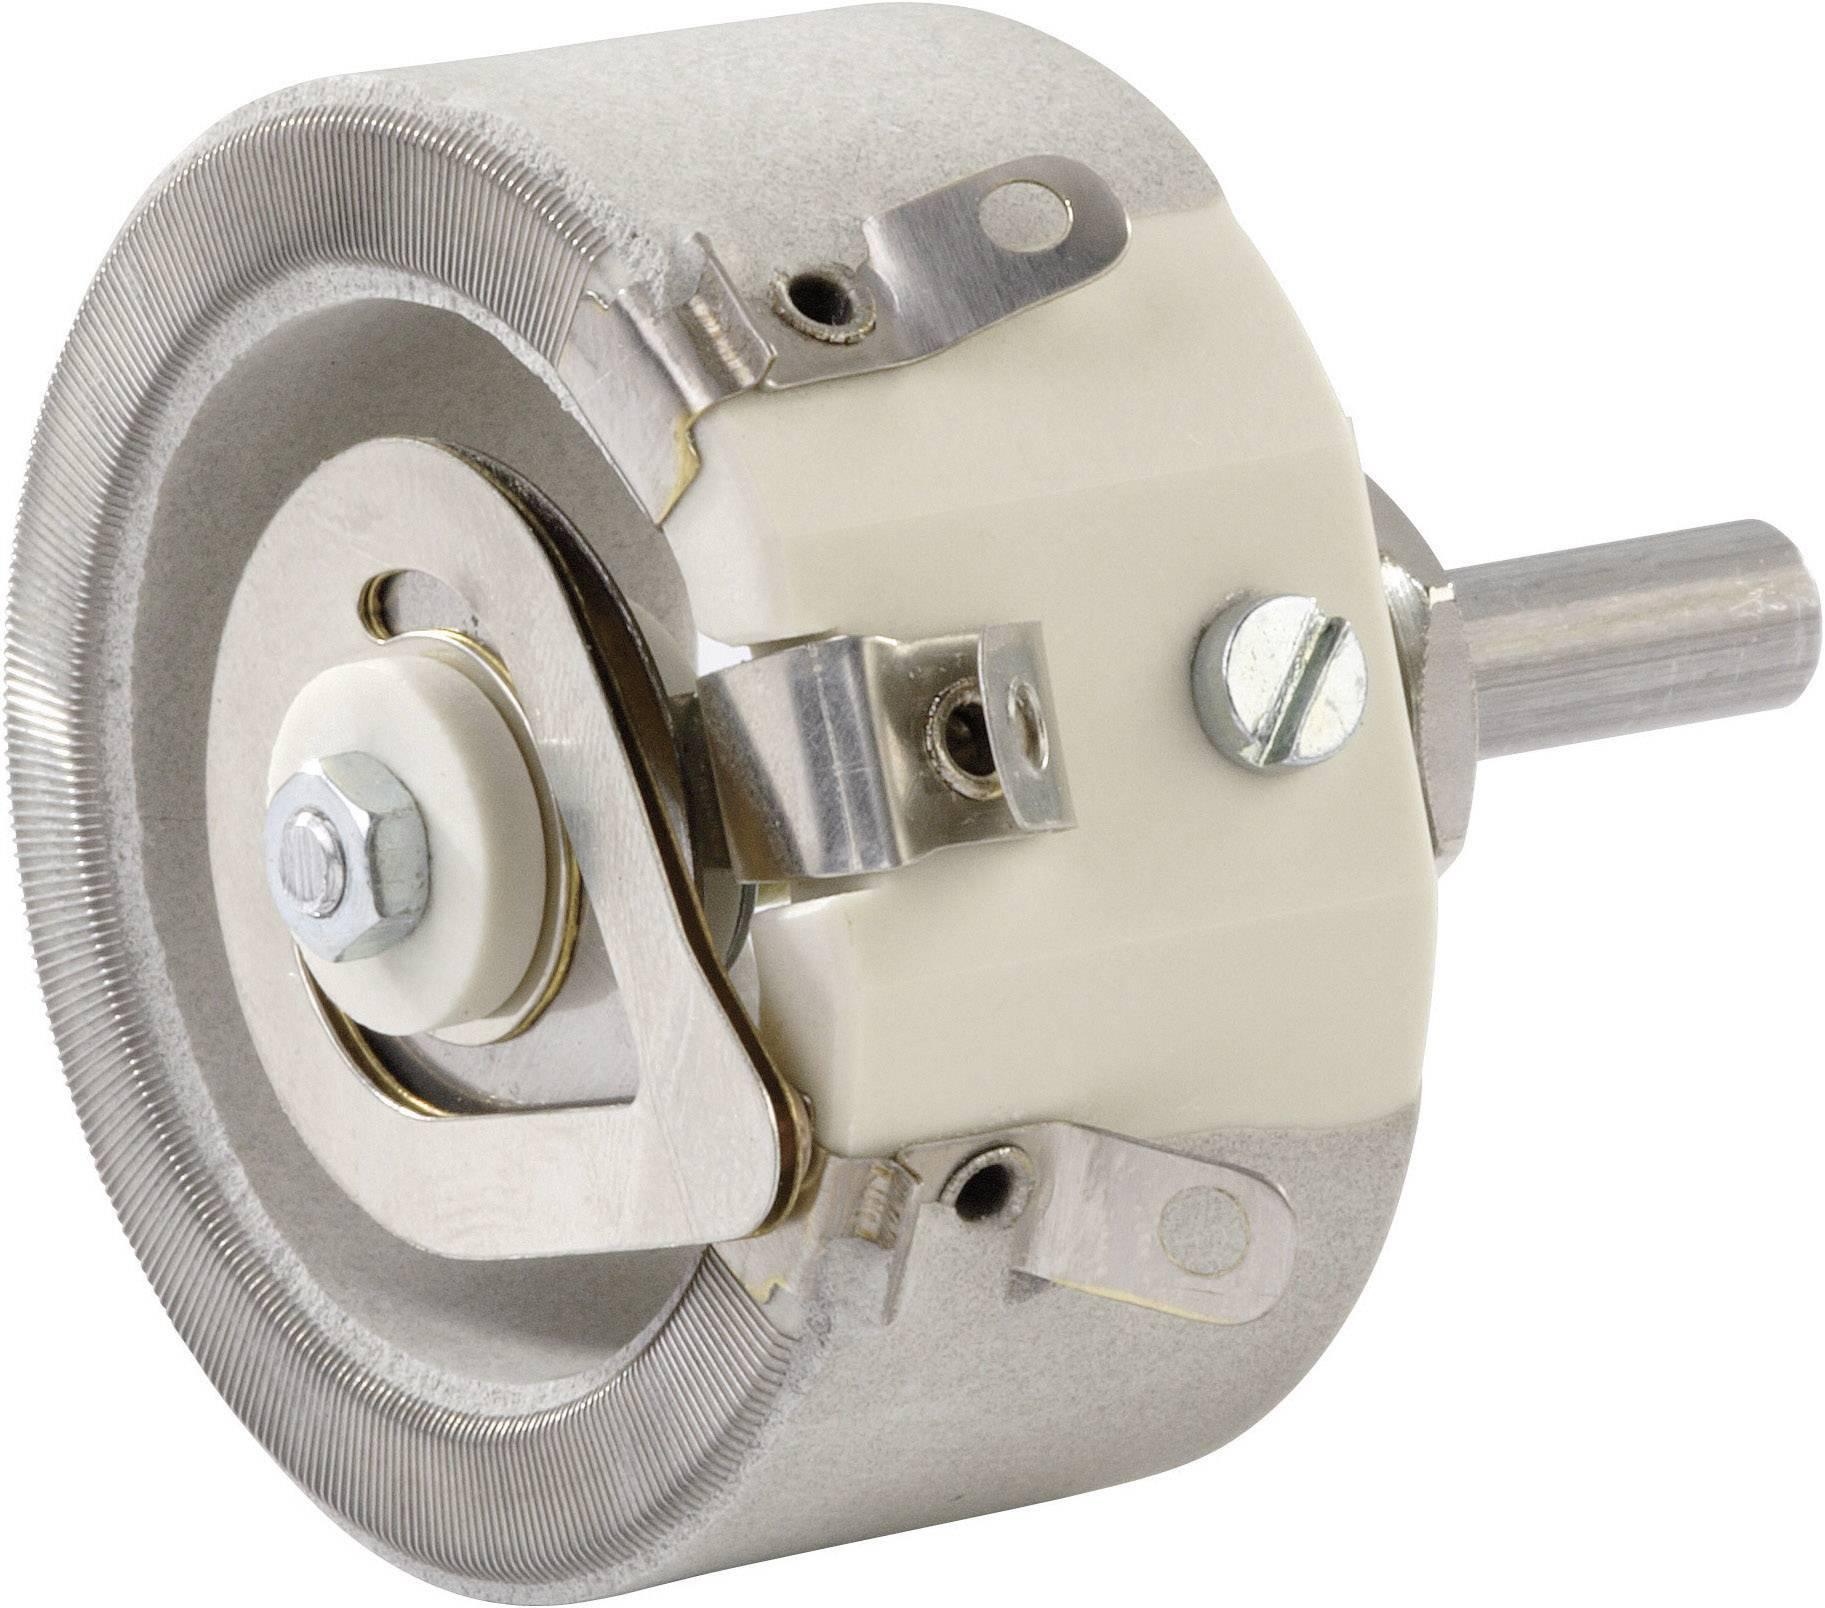 Drôtový potenciometer mono AB Elektronik 3121102700 3121102700, 30 W, 22 Ohm, 1 ks